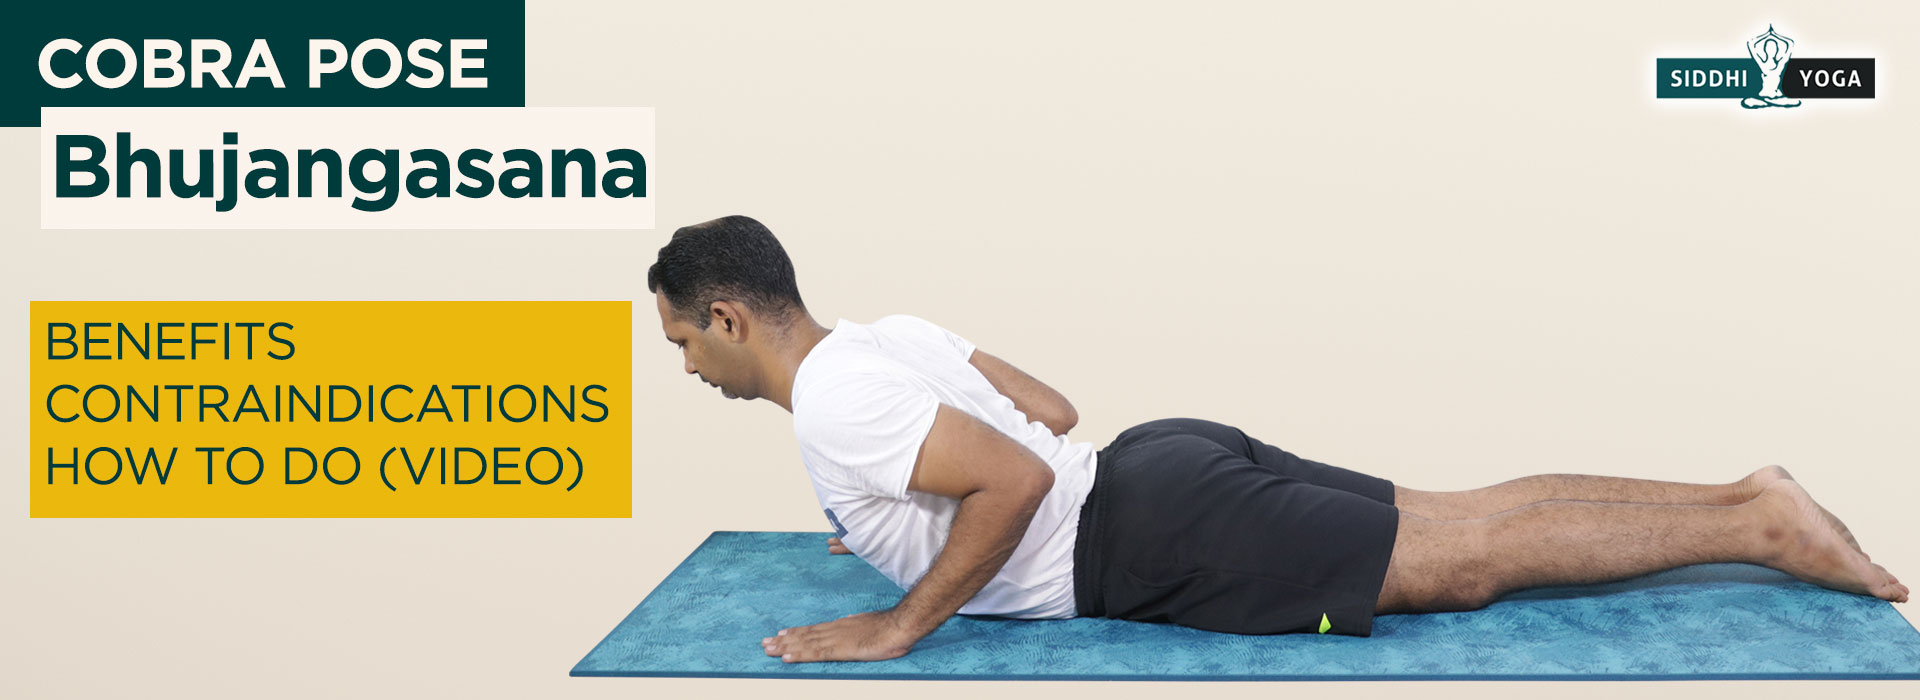 Cobra Pose Yoga Benefits In Hindi